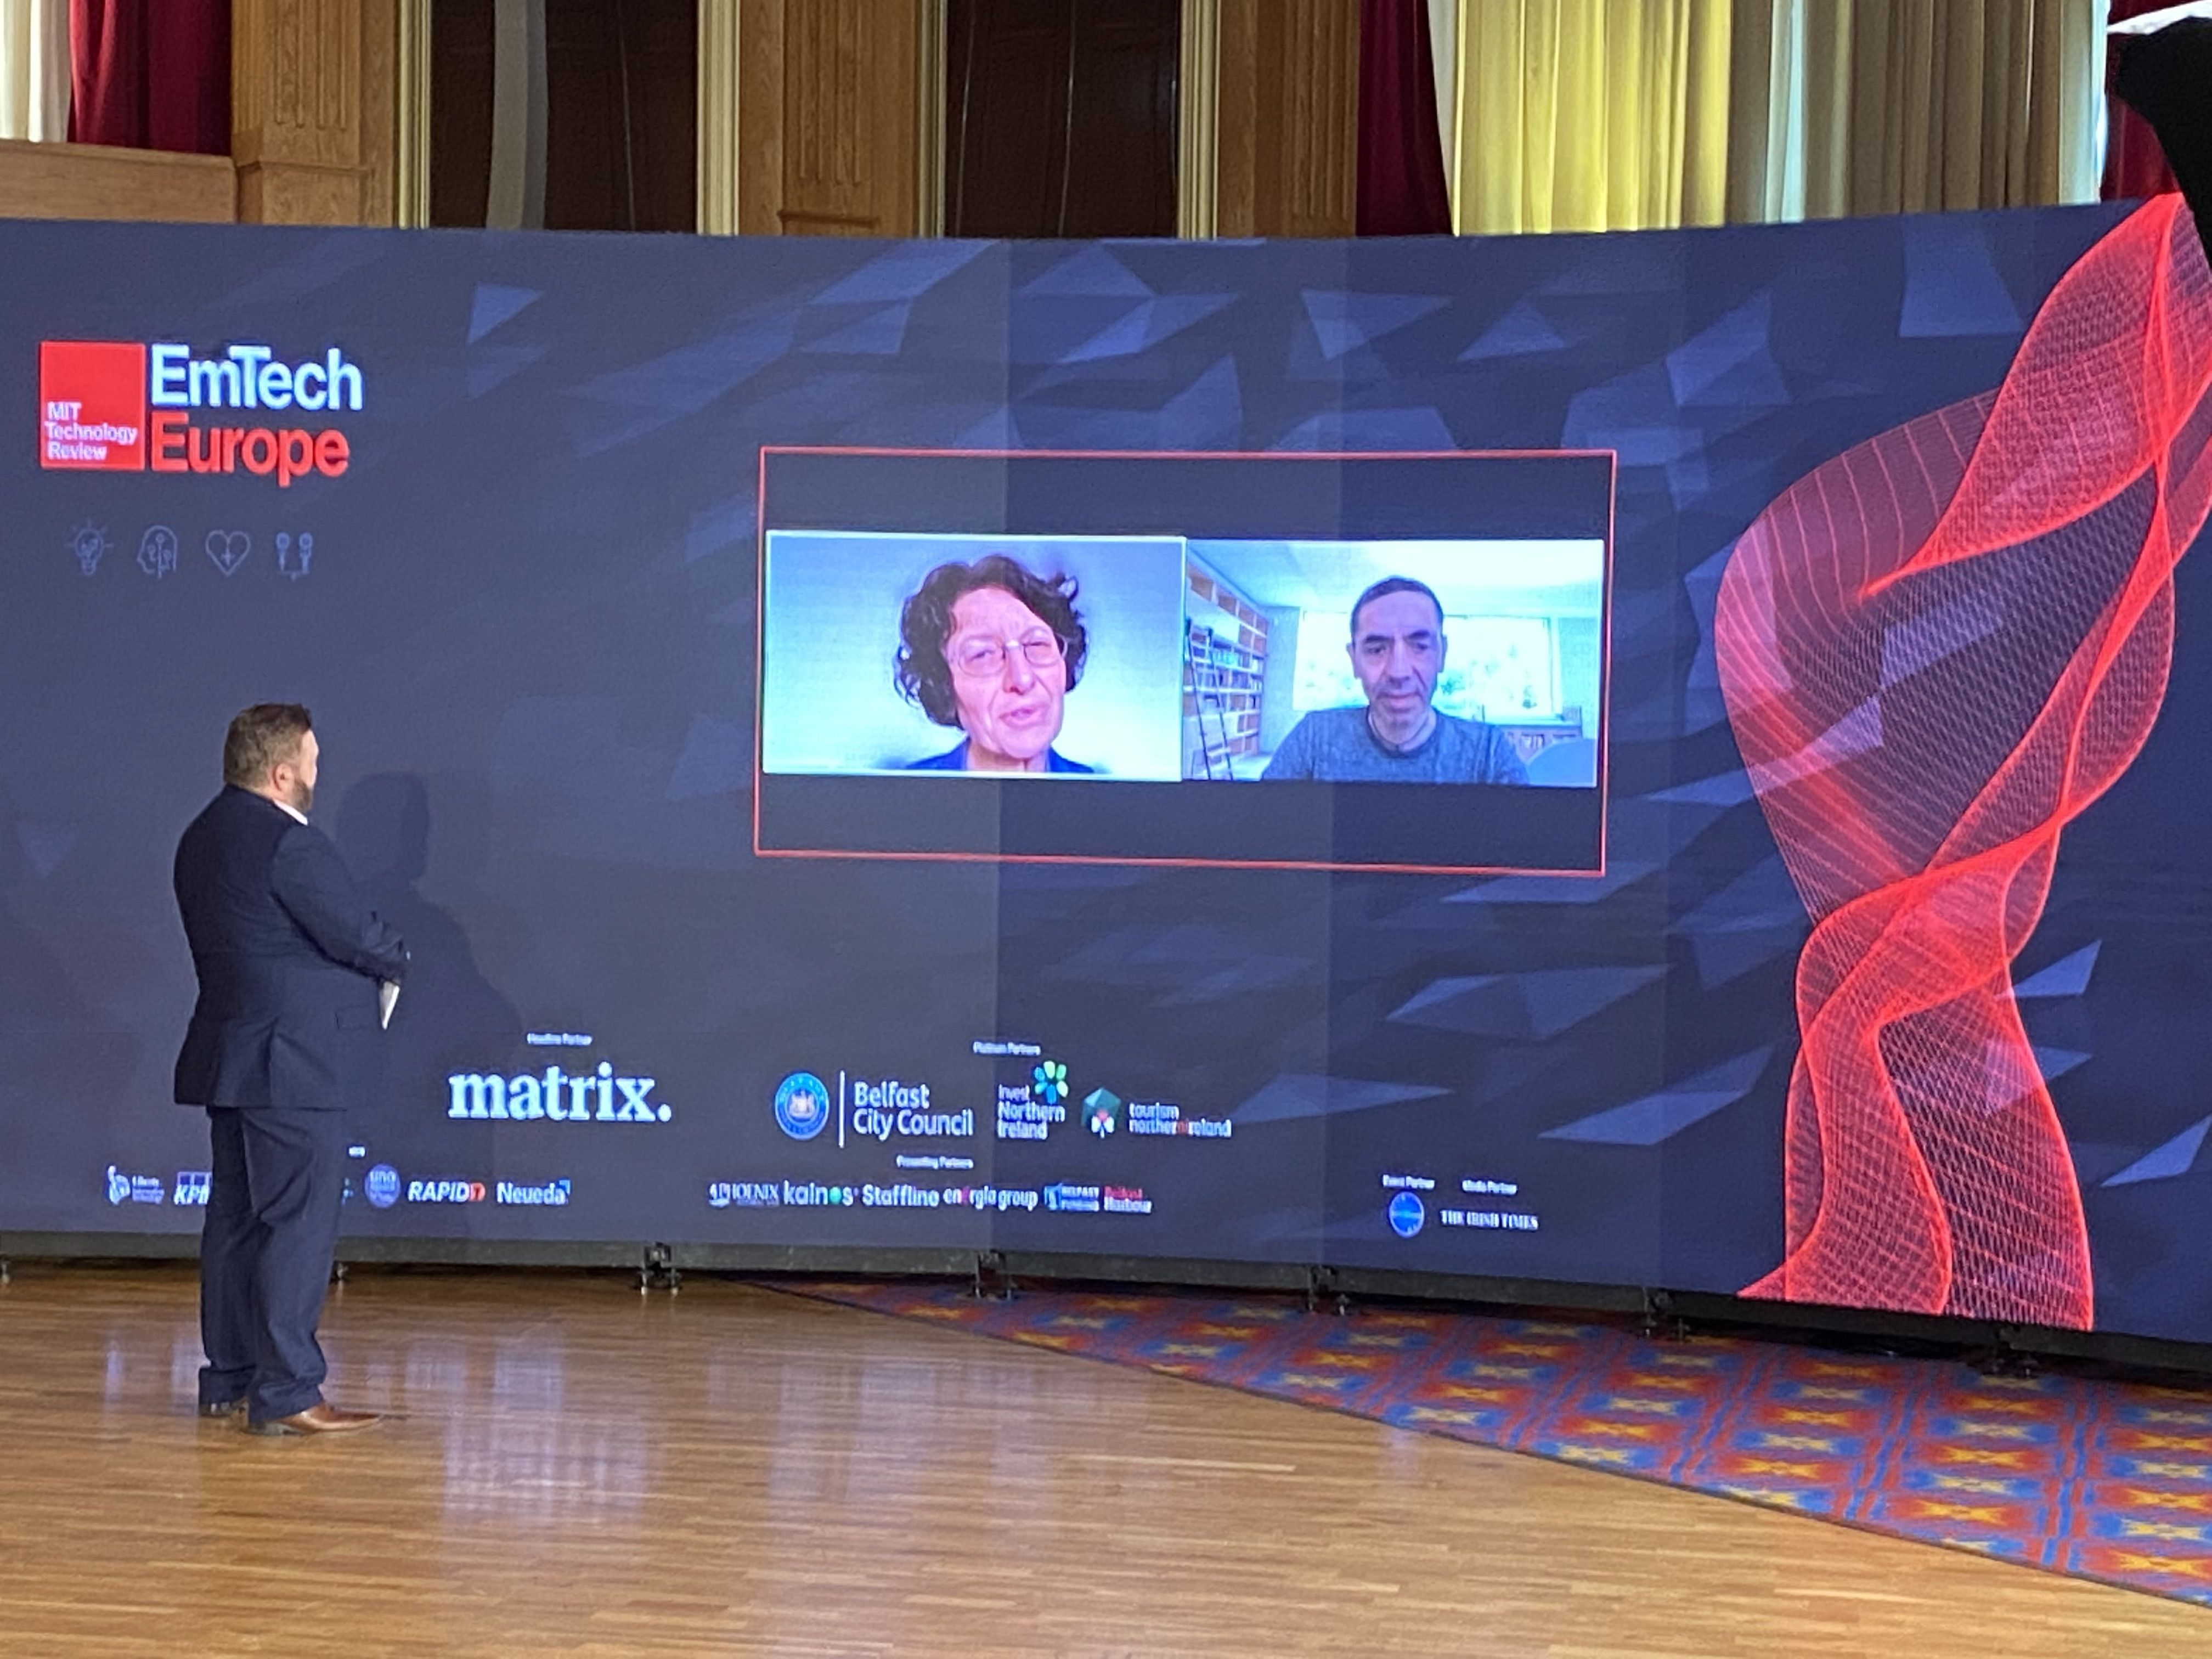 KNOWLEDGE CAPITAL: Broadcaster William Crawley interviewing BioNTech founders Özlem Türeci and Urug Sahin